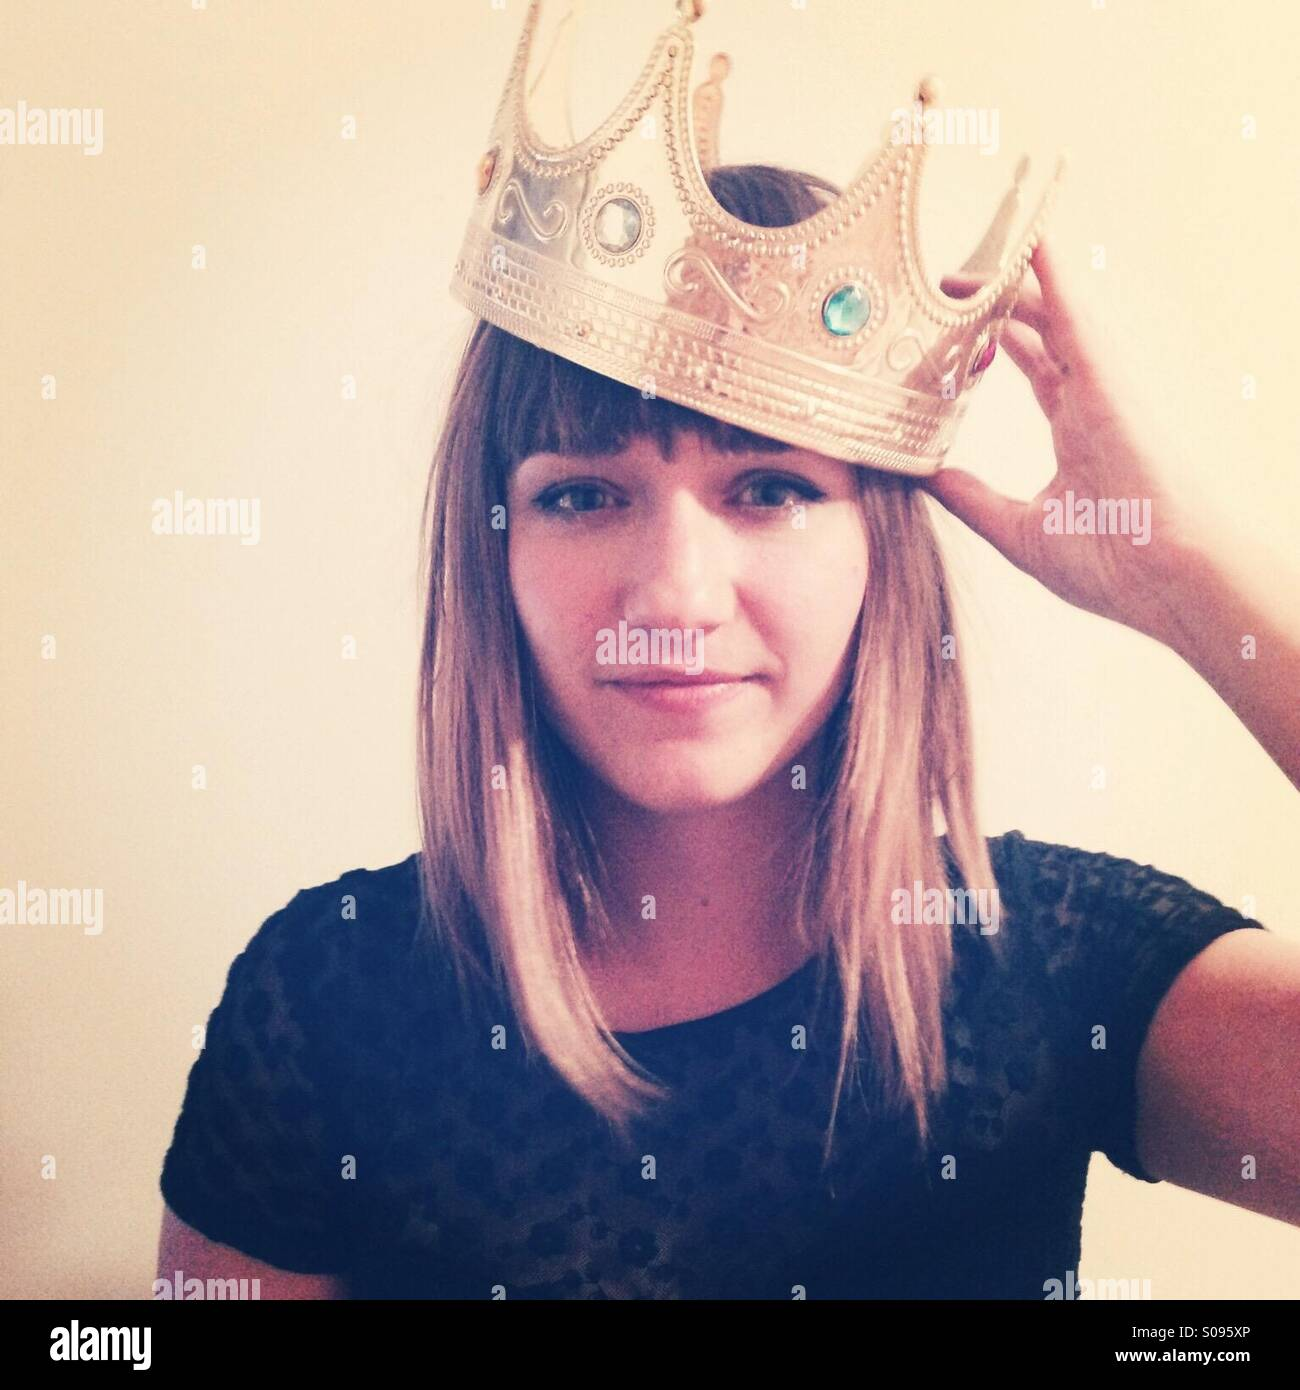 Junge Frau trägt Krone. Stockbild